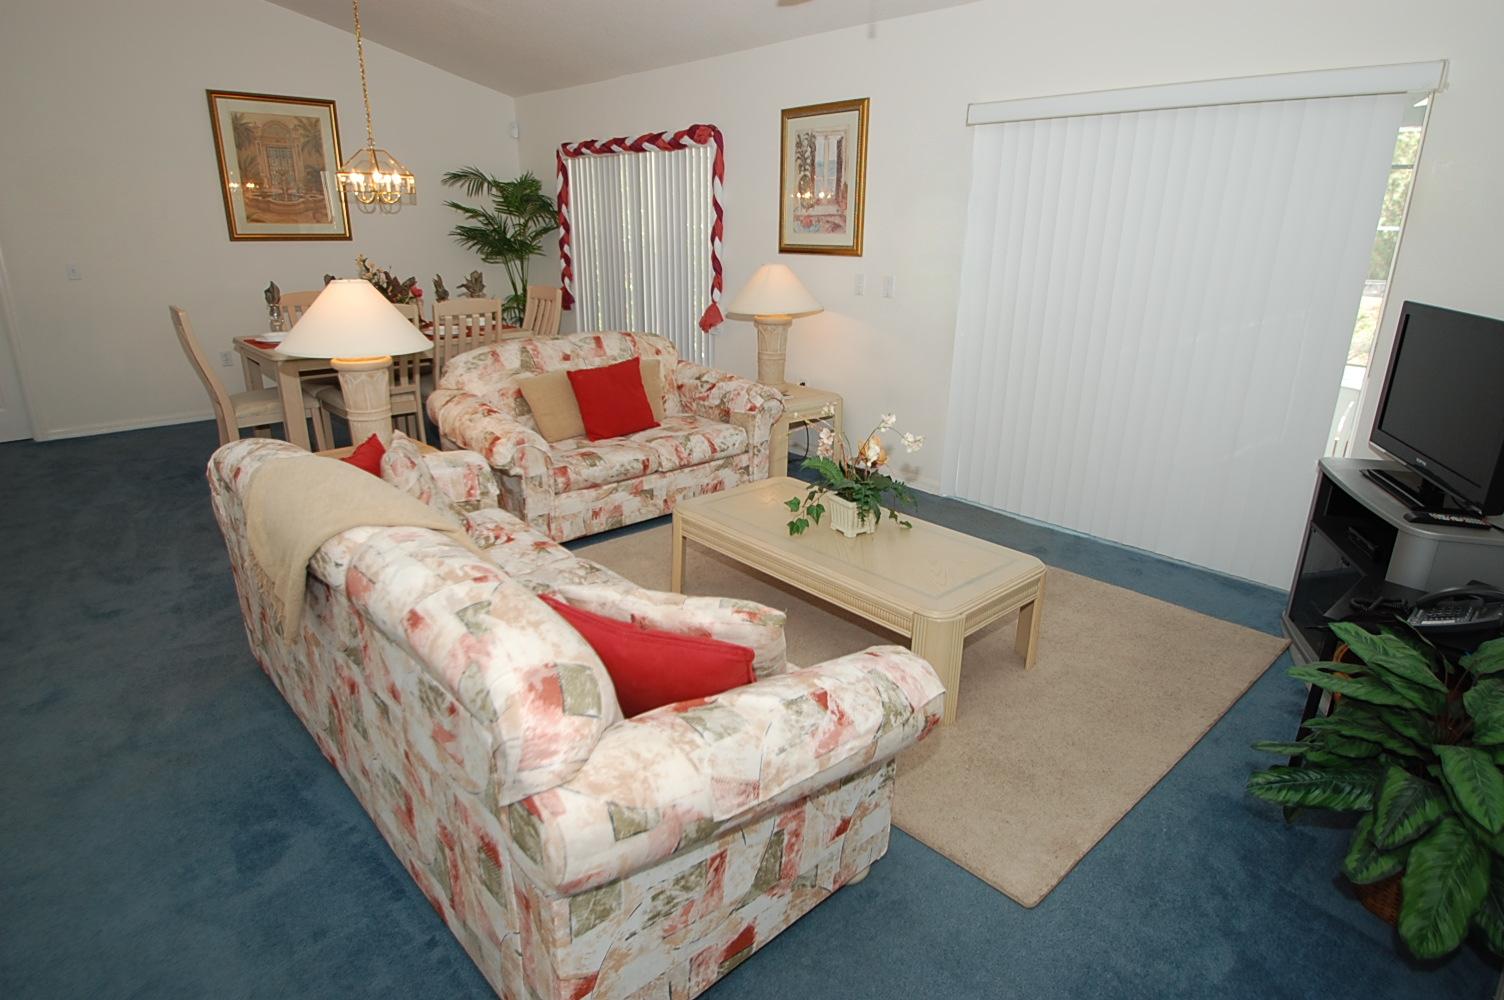 https://shop.orlandovacation.com/hotelphotos/RHN_DSC_7473.JPG